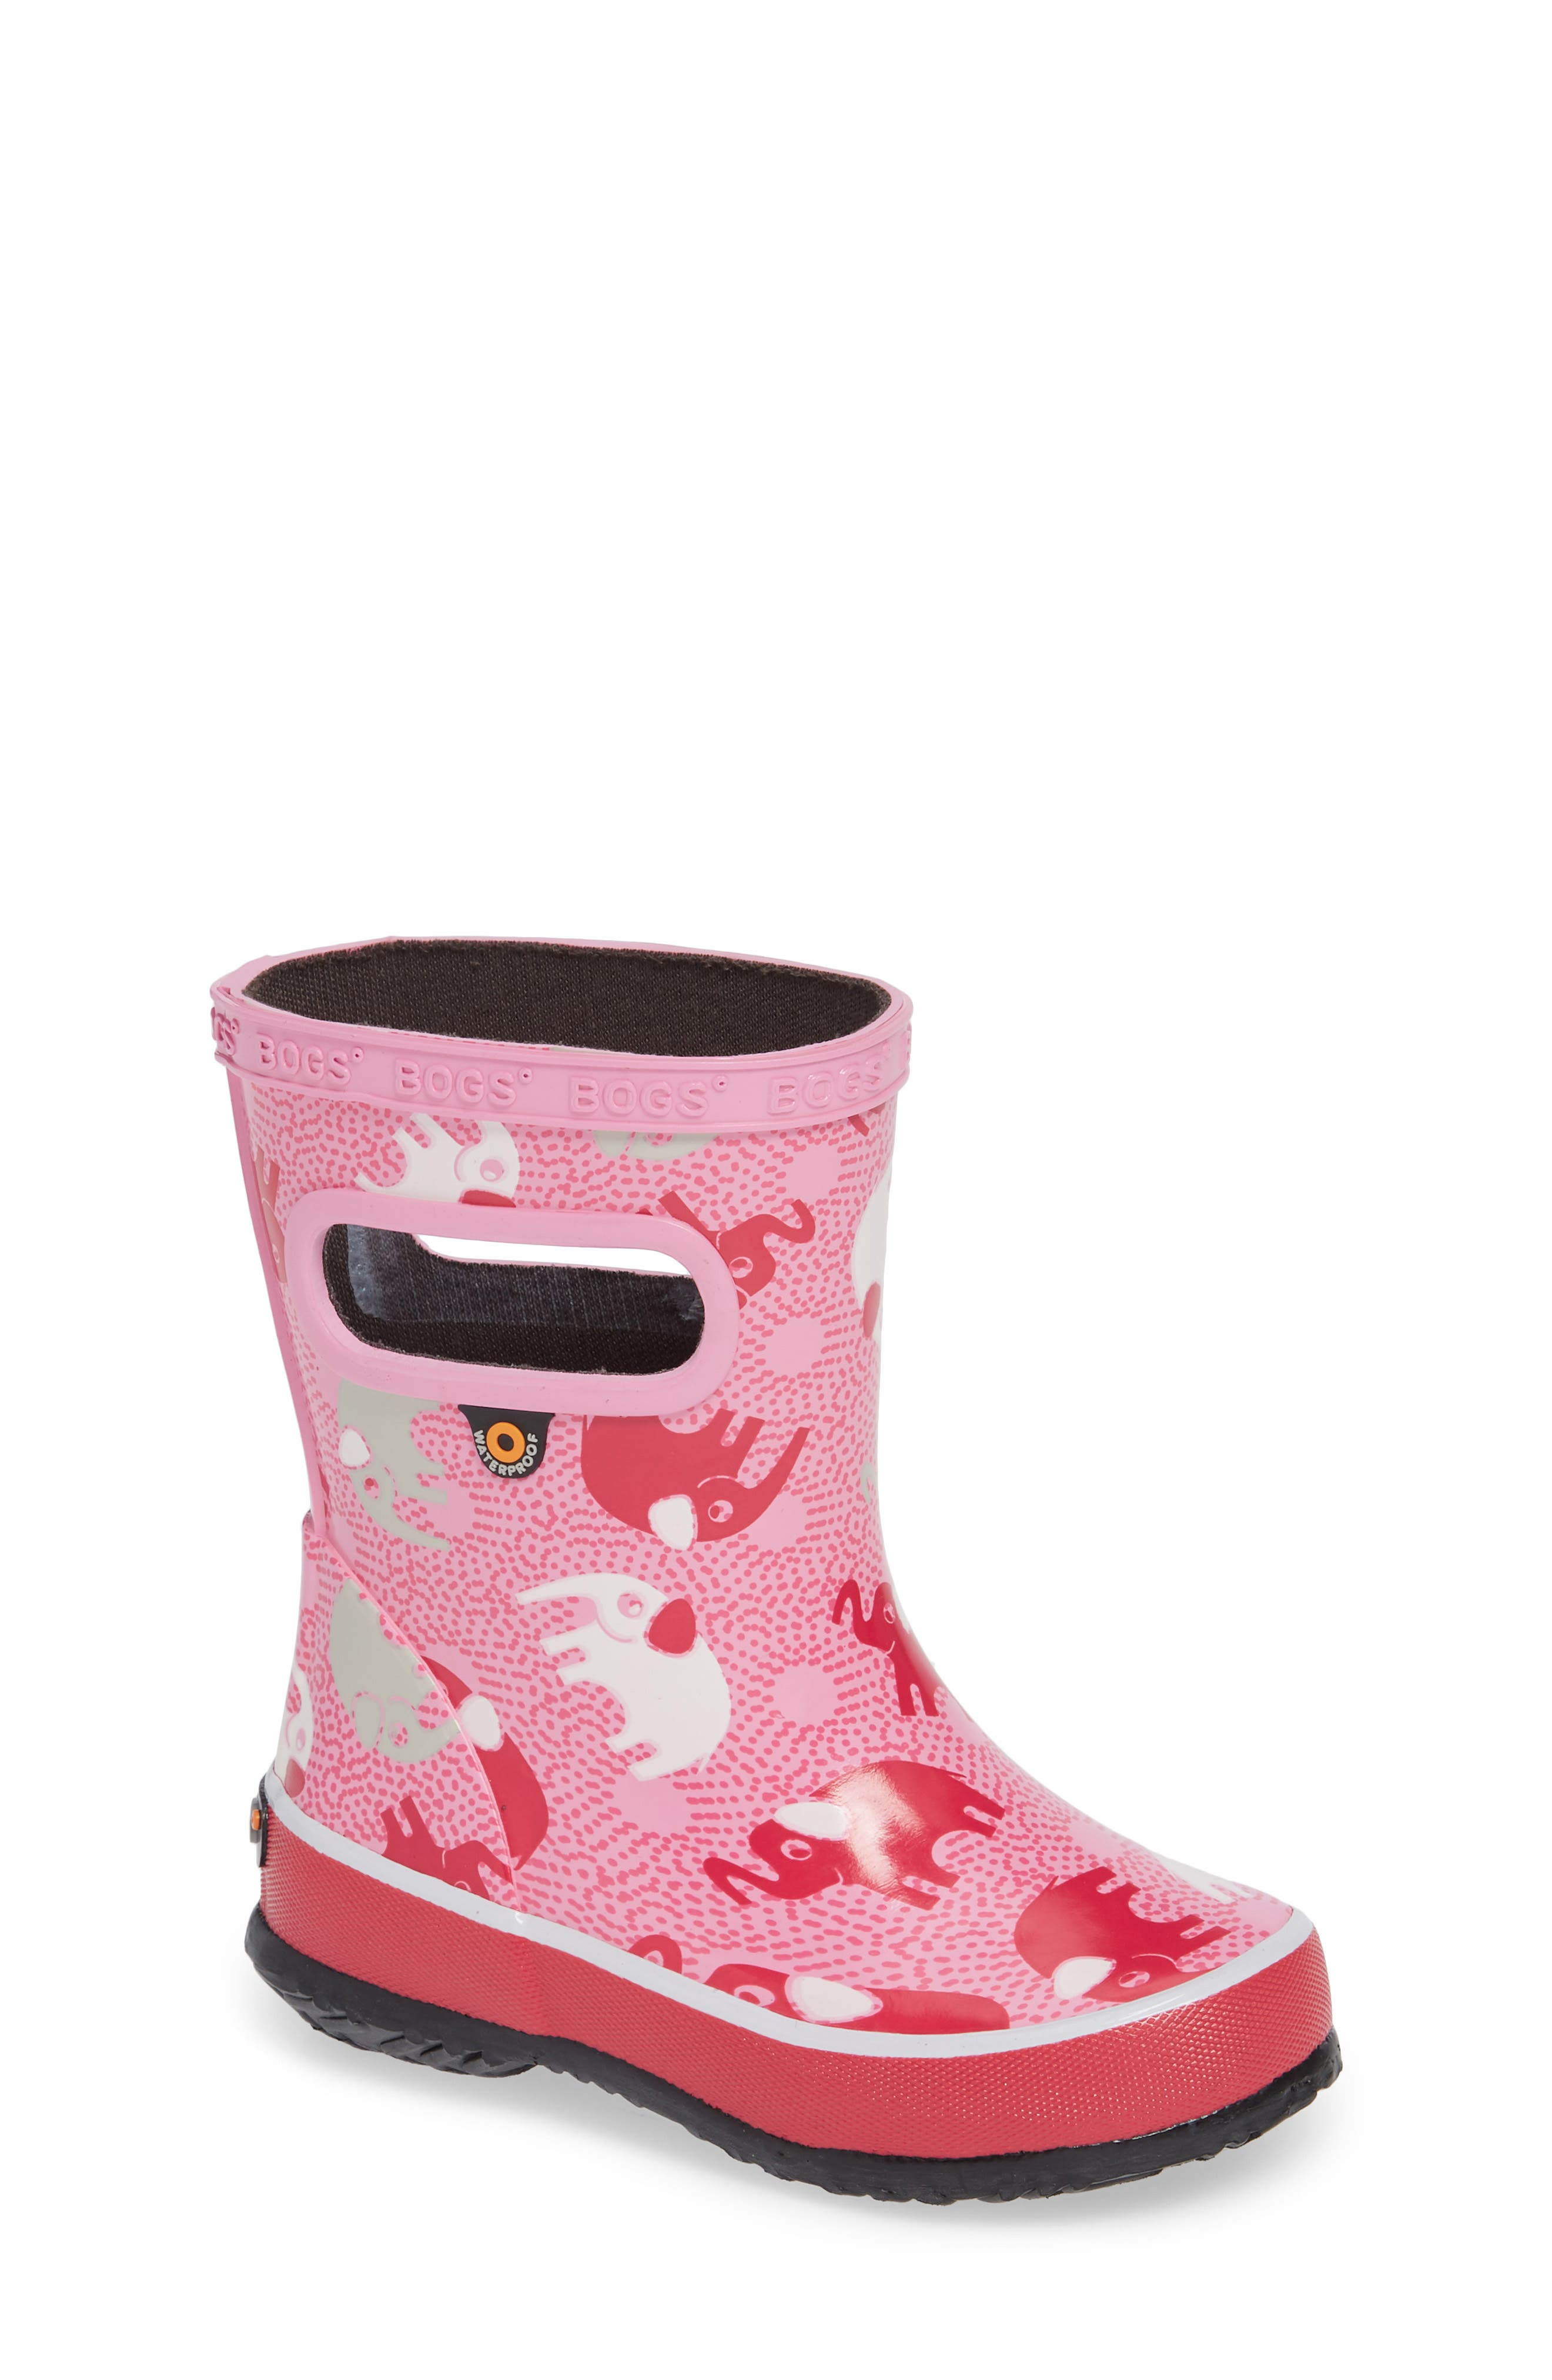 Skipper Elephant Print Rubber Rain Boot,                         Main,                         color, PINK MULTI